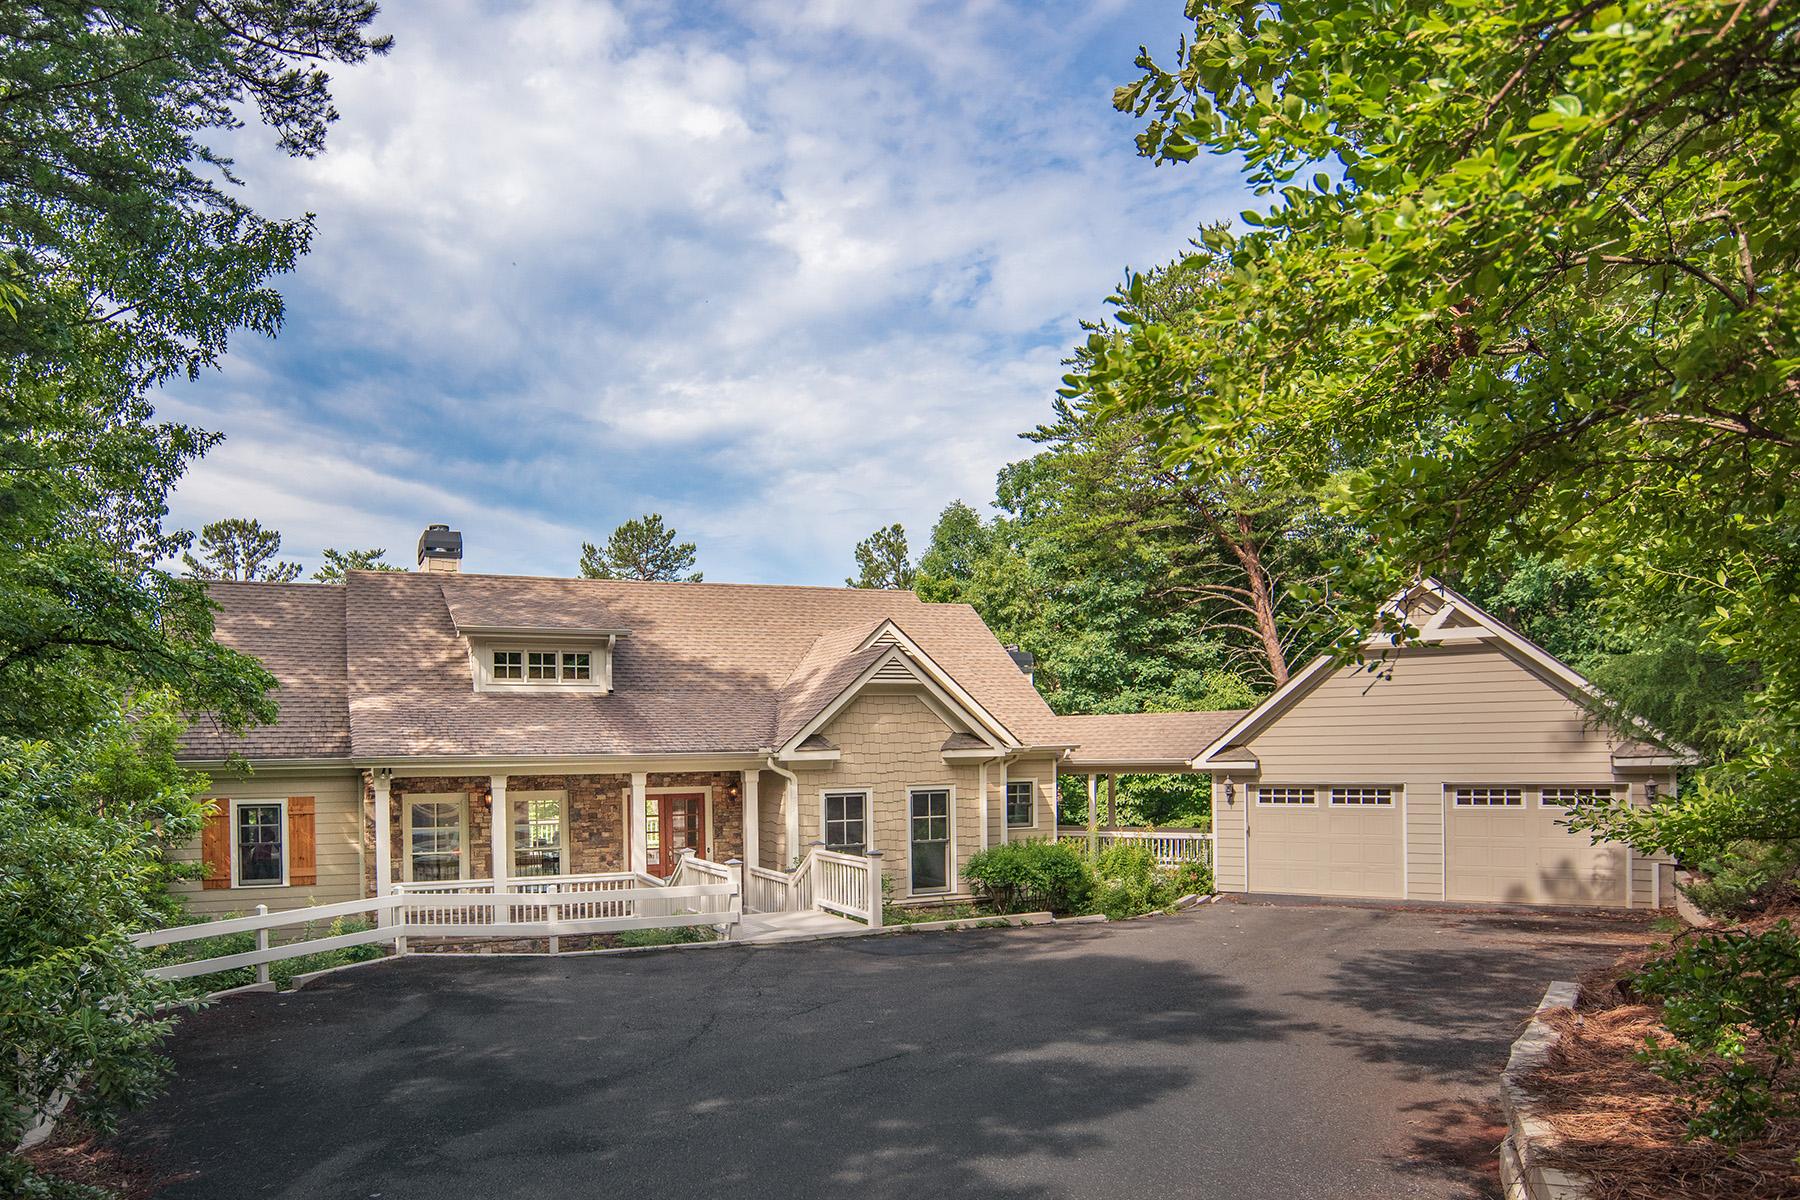 Single Family Home for Sale at Serene Mountain Living 274 Wood Poppy Drive Big Canoe, Georgia 30143 United States